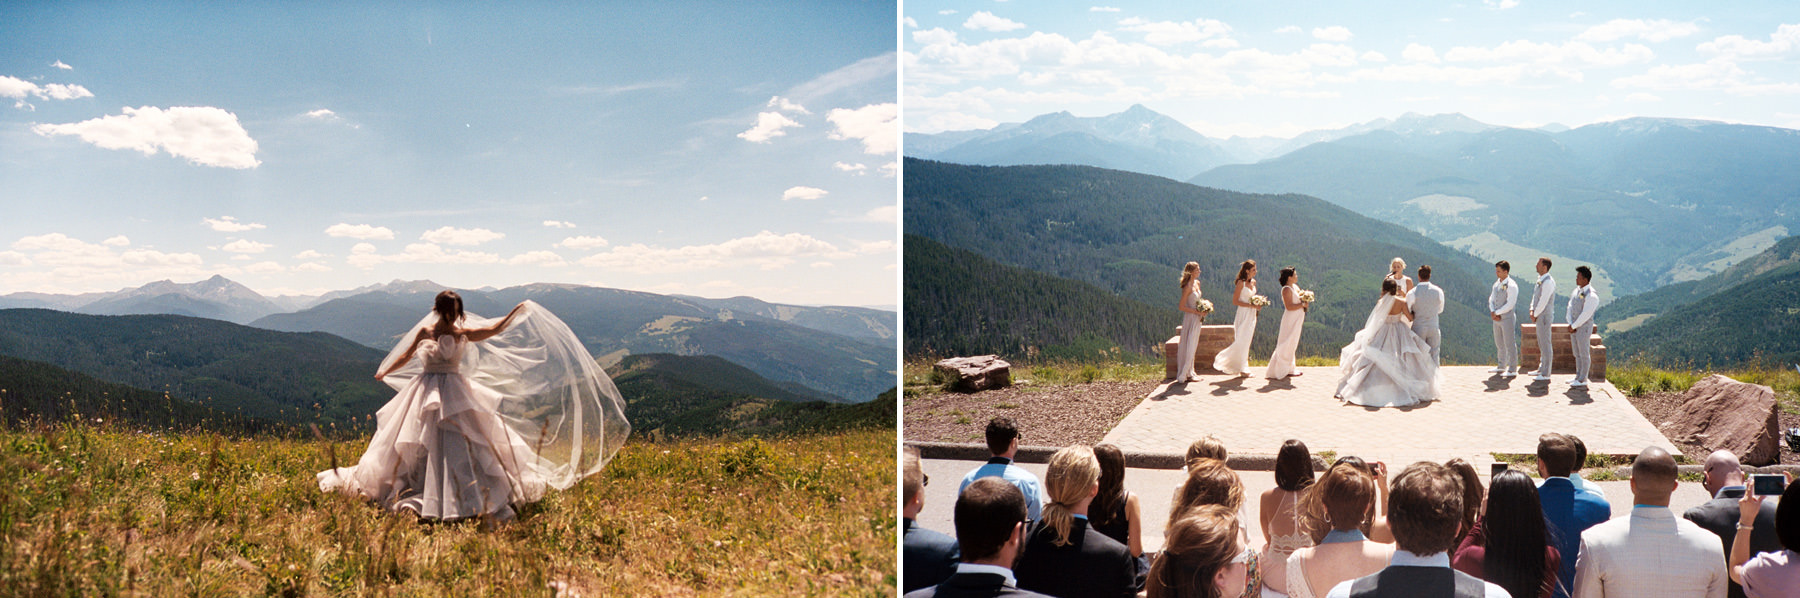 Vail Colorado Wedding Deck_ Kindling Wedding Photography107.JPG